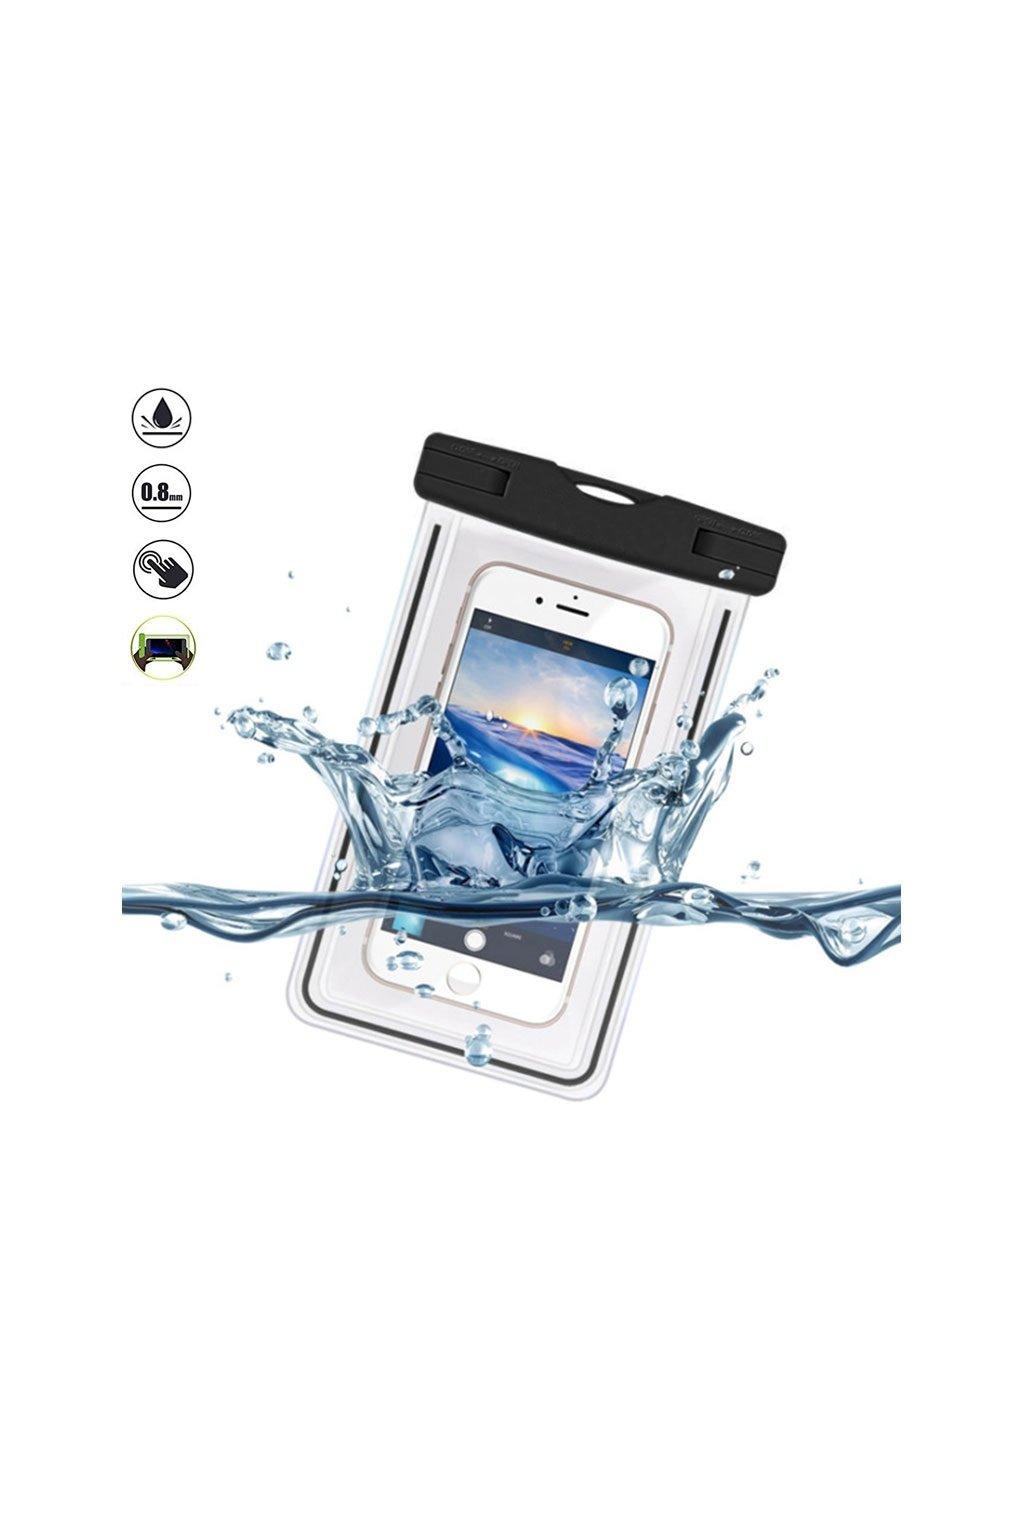 1811 plazove vodedolne pouzdro na mobil devia waterproof bag